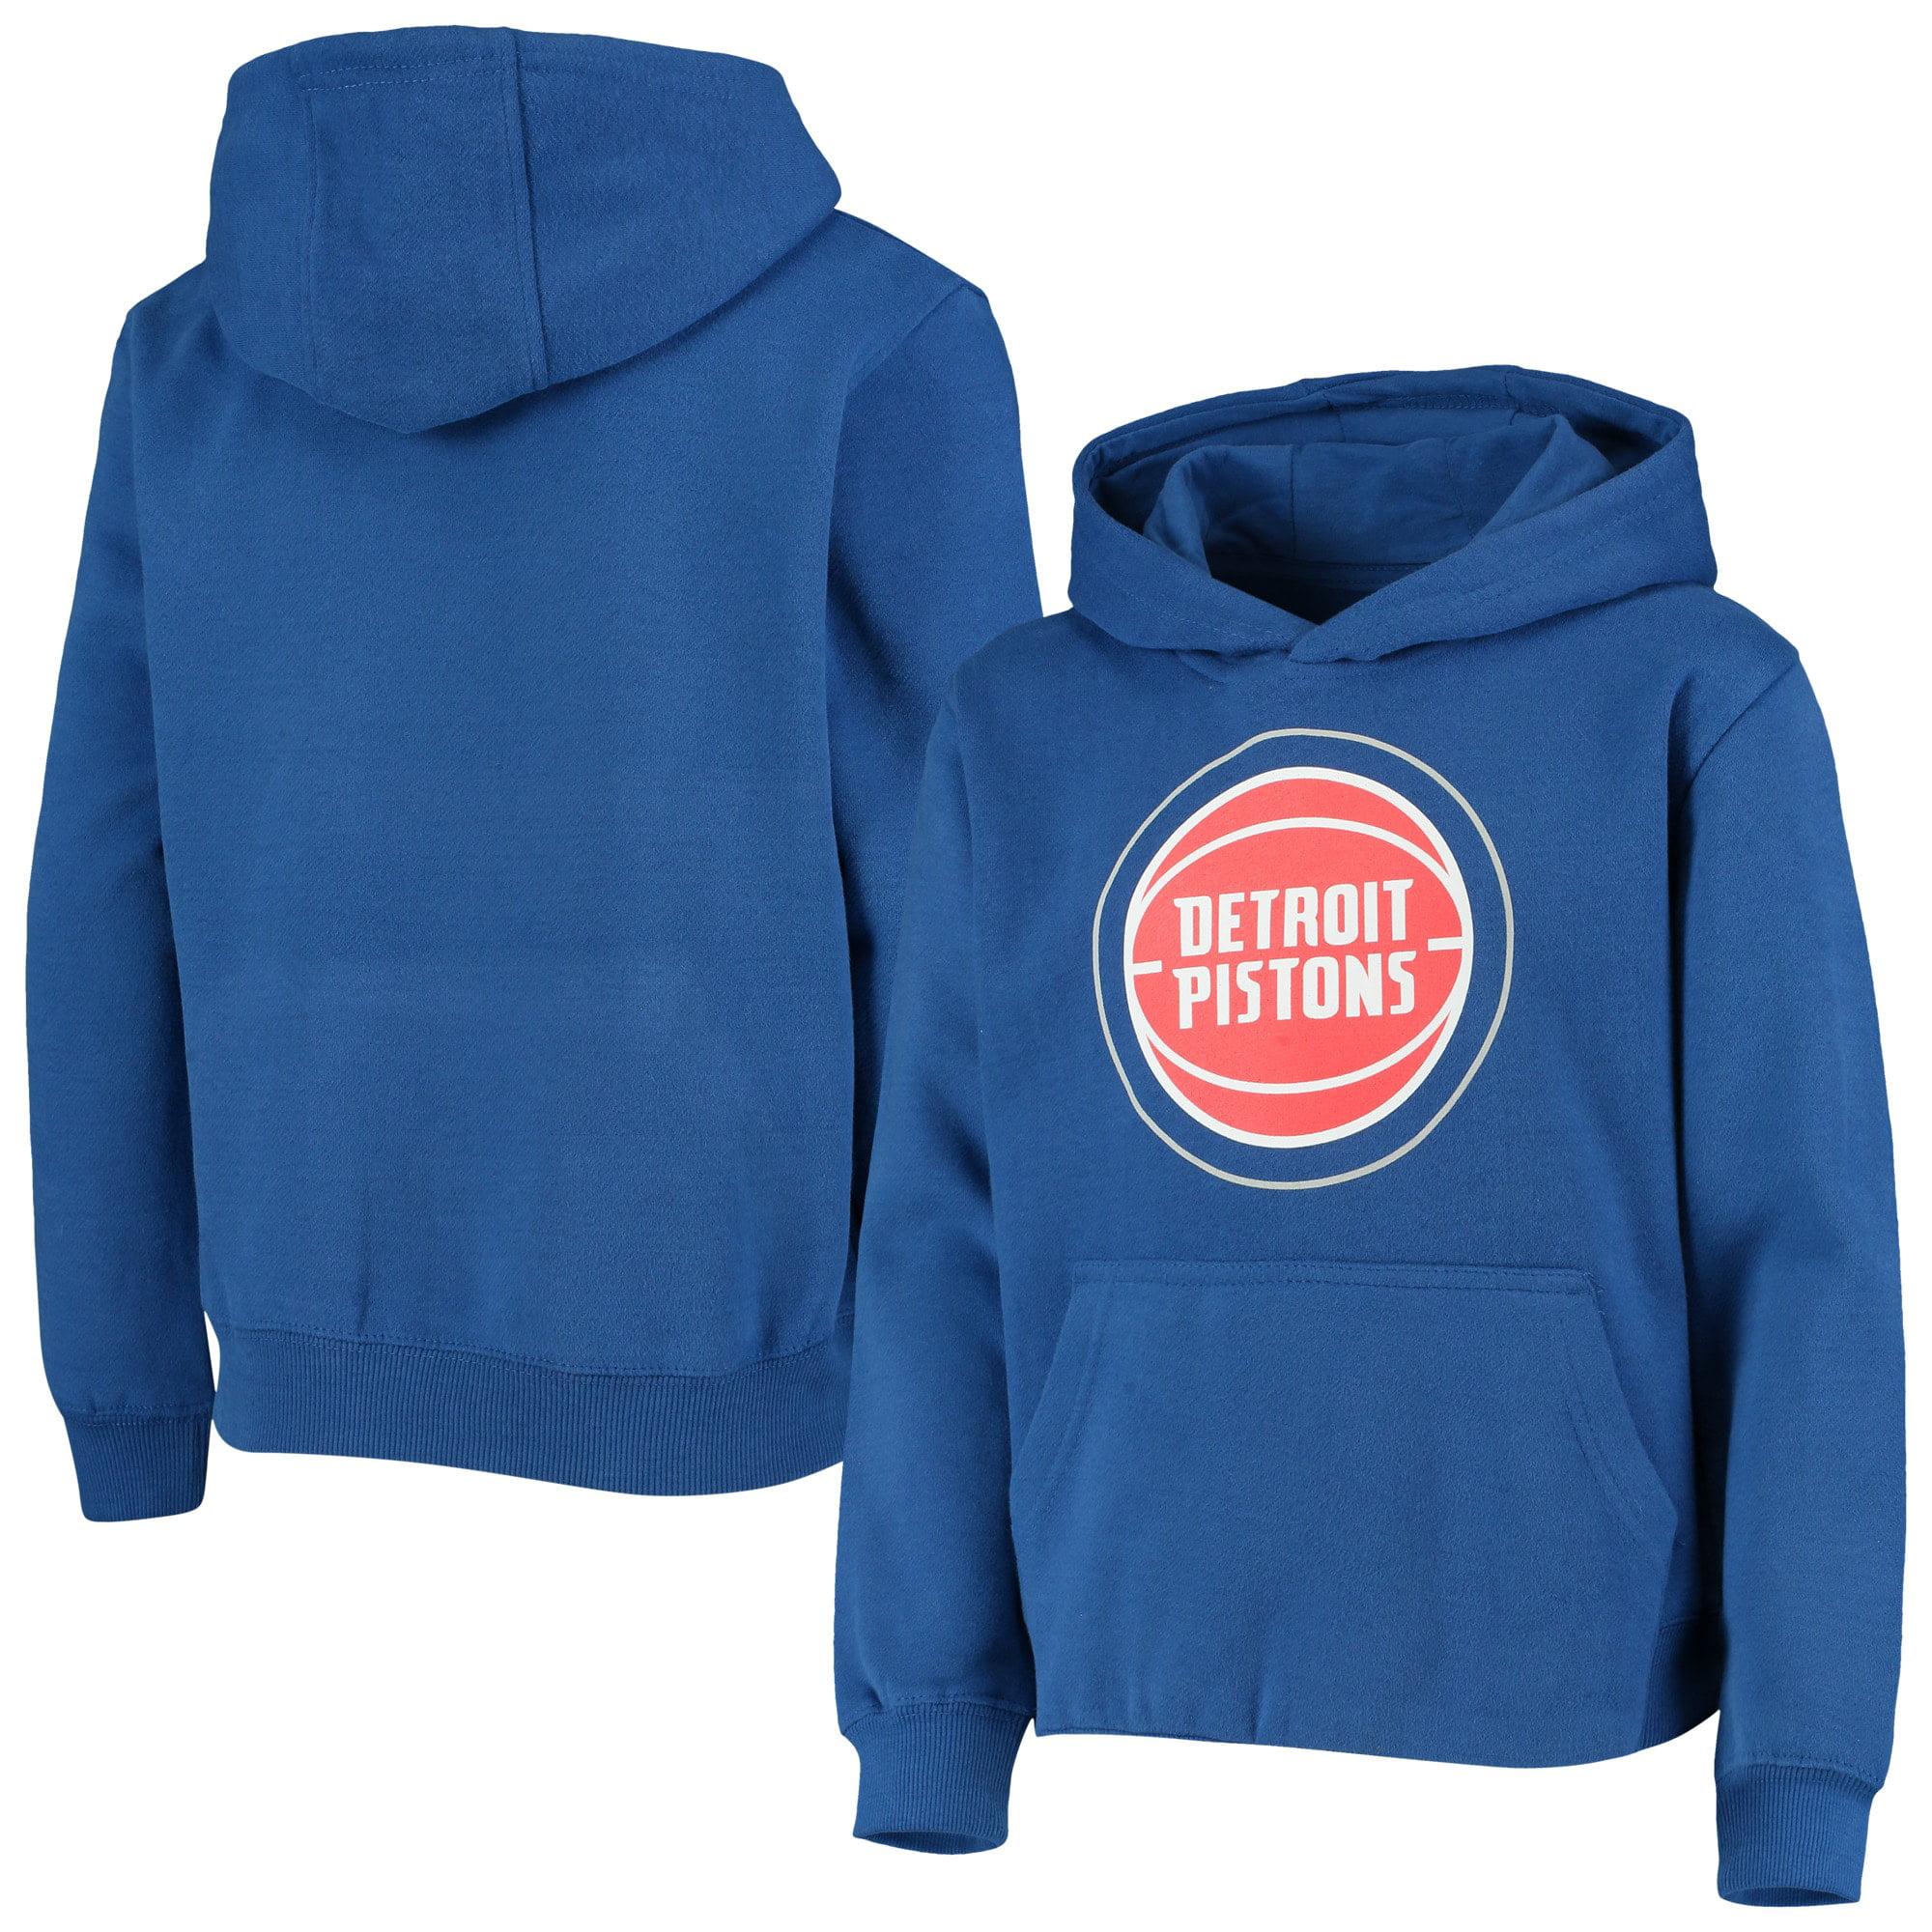 Blue OuterStuff NBA Youth Detroit Pistons Fleece Pullover Hoodie